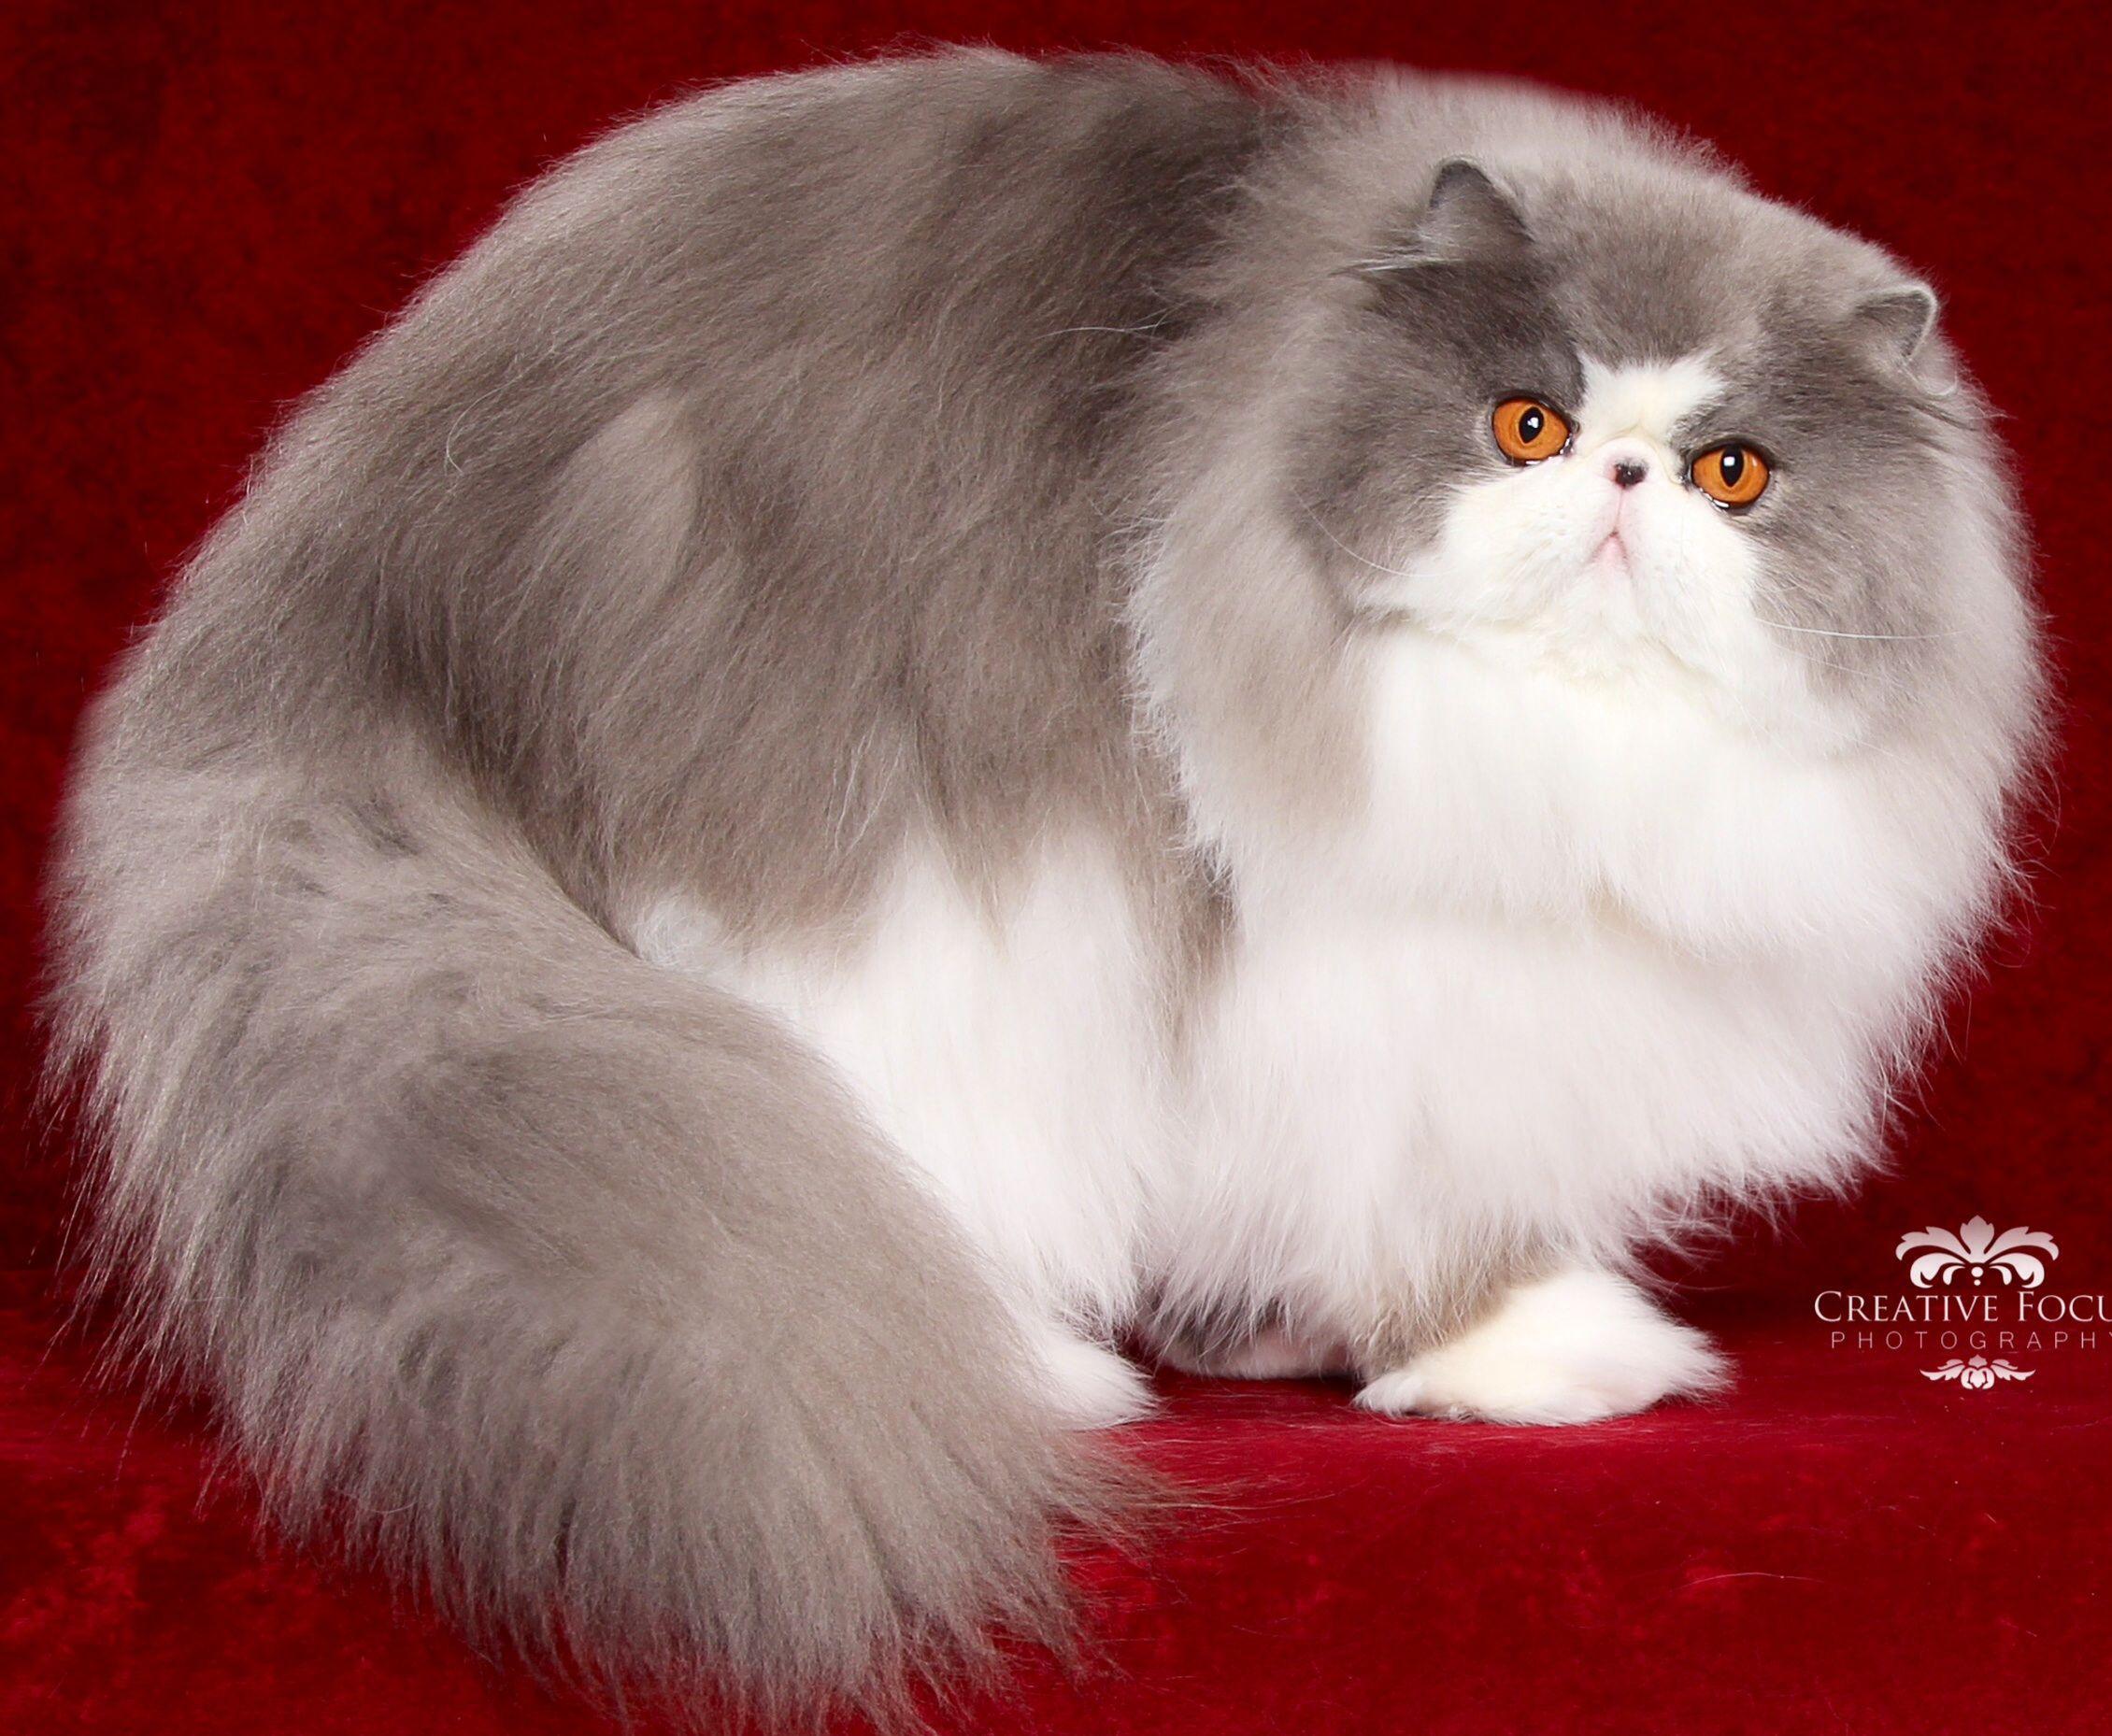 Beautiful Persian Pretty Cats Cute Cats And Kittens Cute Cats